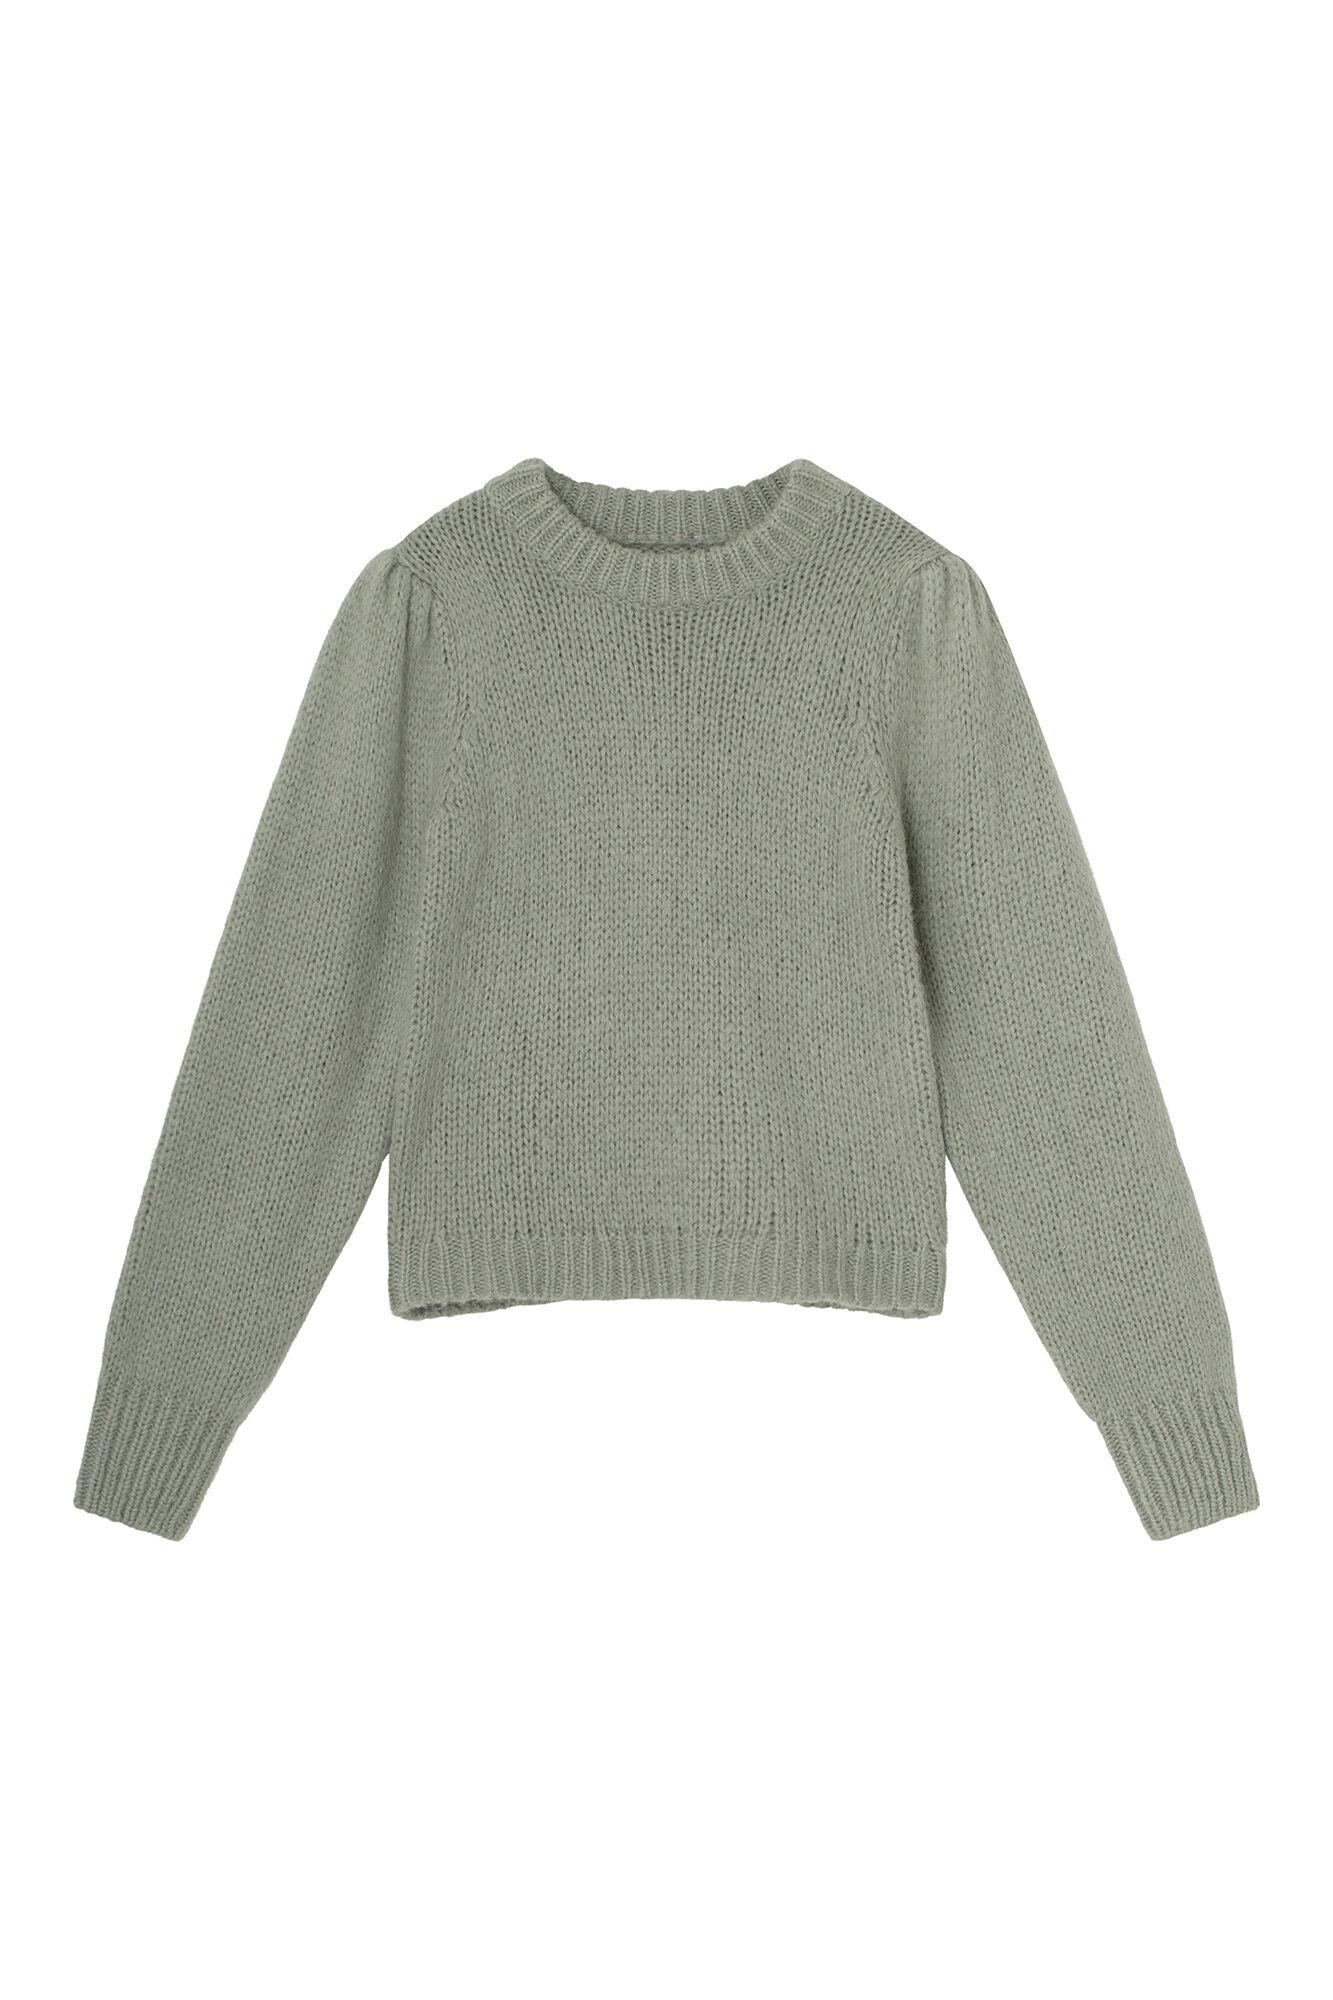 Envii Entrepka LS knit, chinois mel, x-large